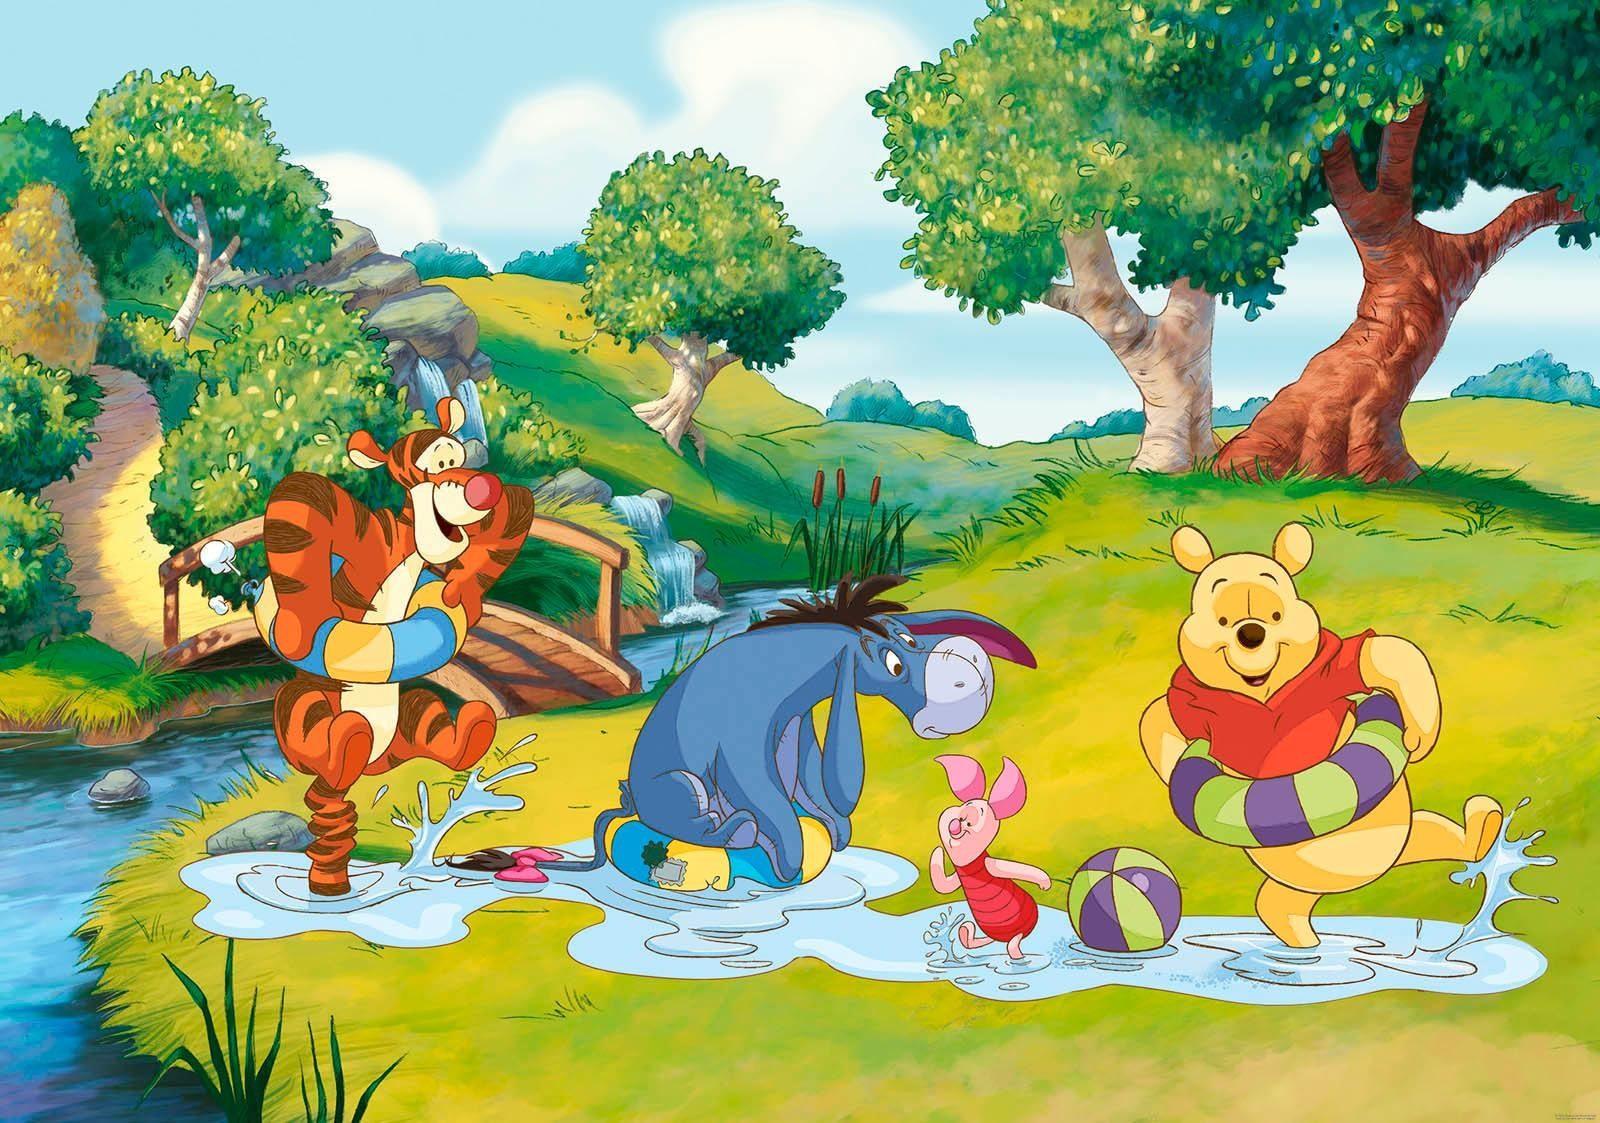 Fototapete »Winnie the Pooh« 254/184 cm